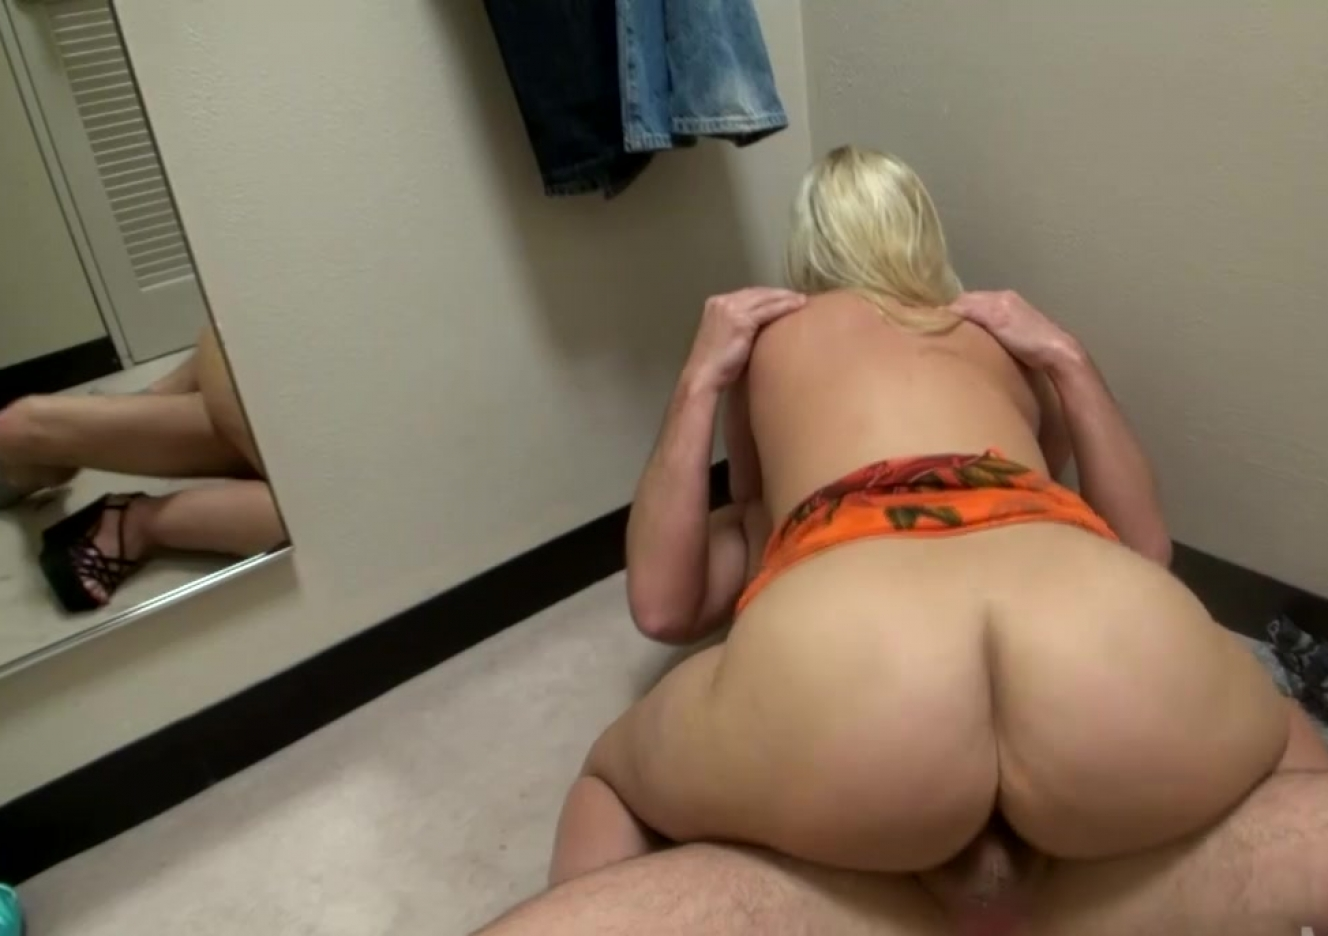 nudr brazillian sexi girl having hard sex